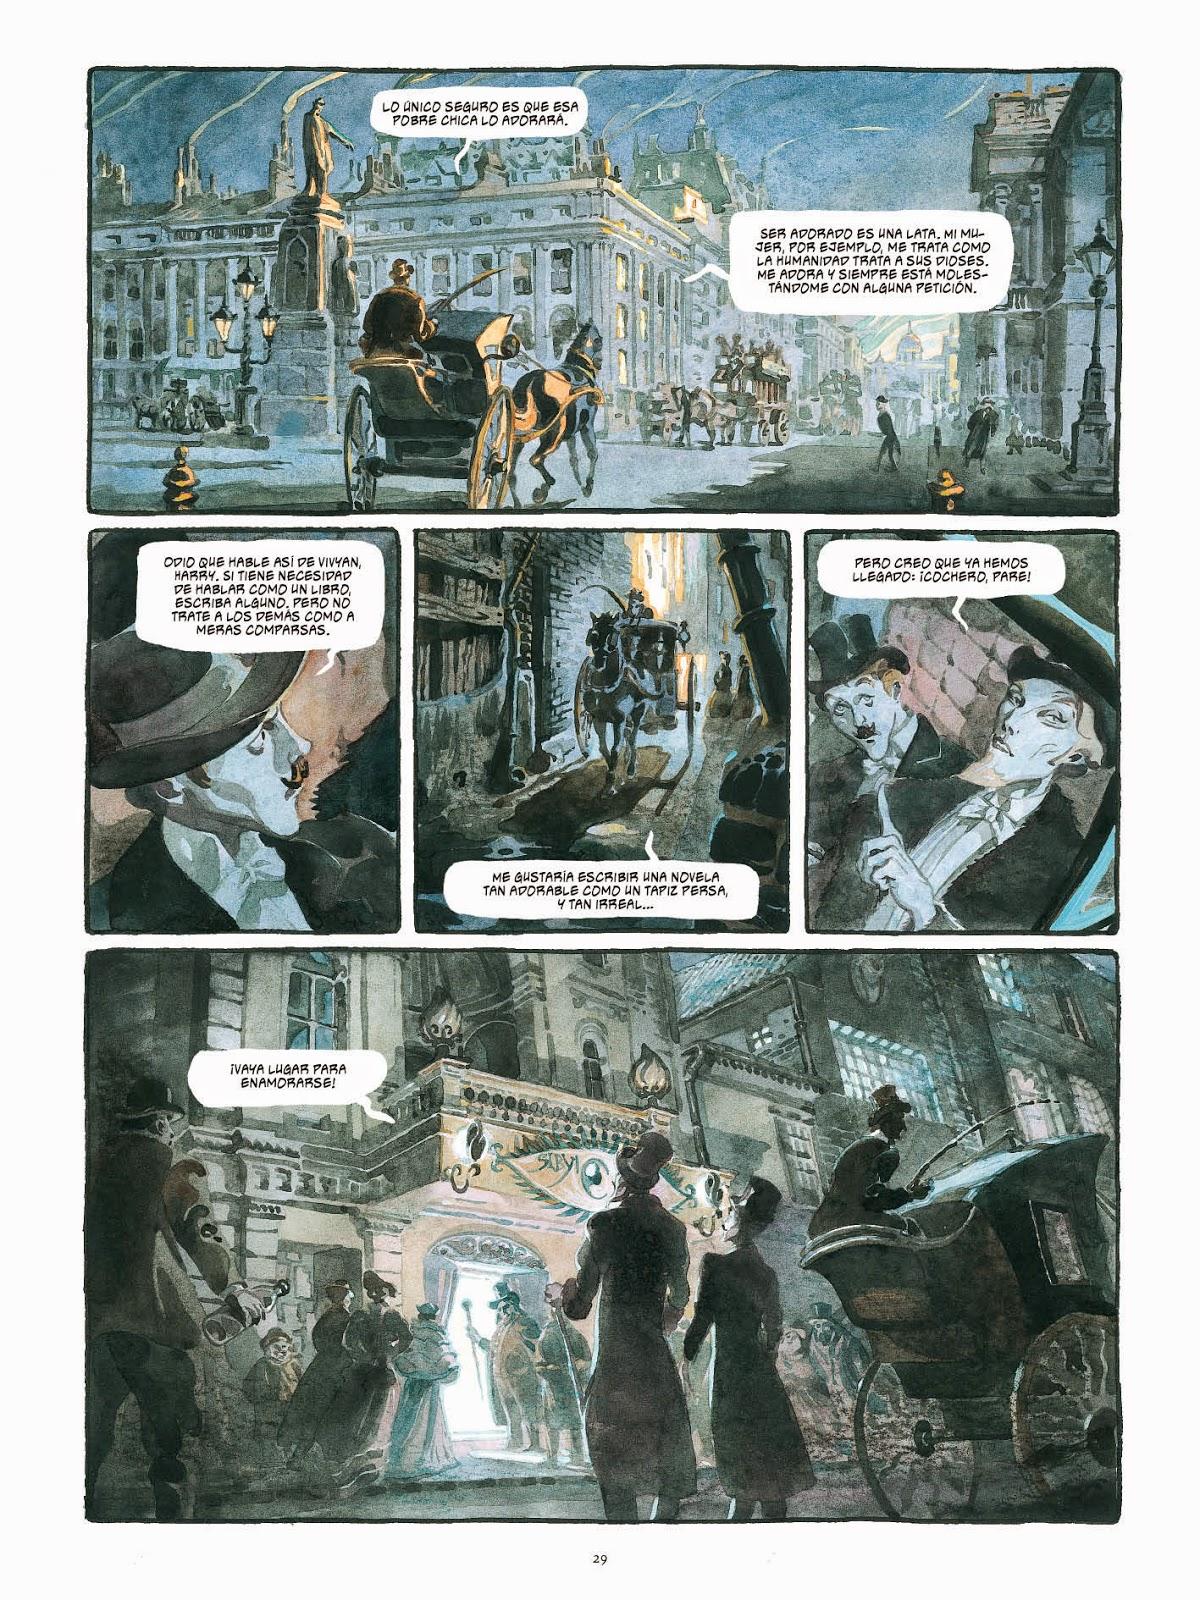 dorian gray comic